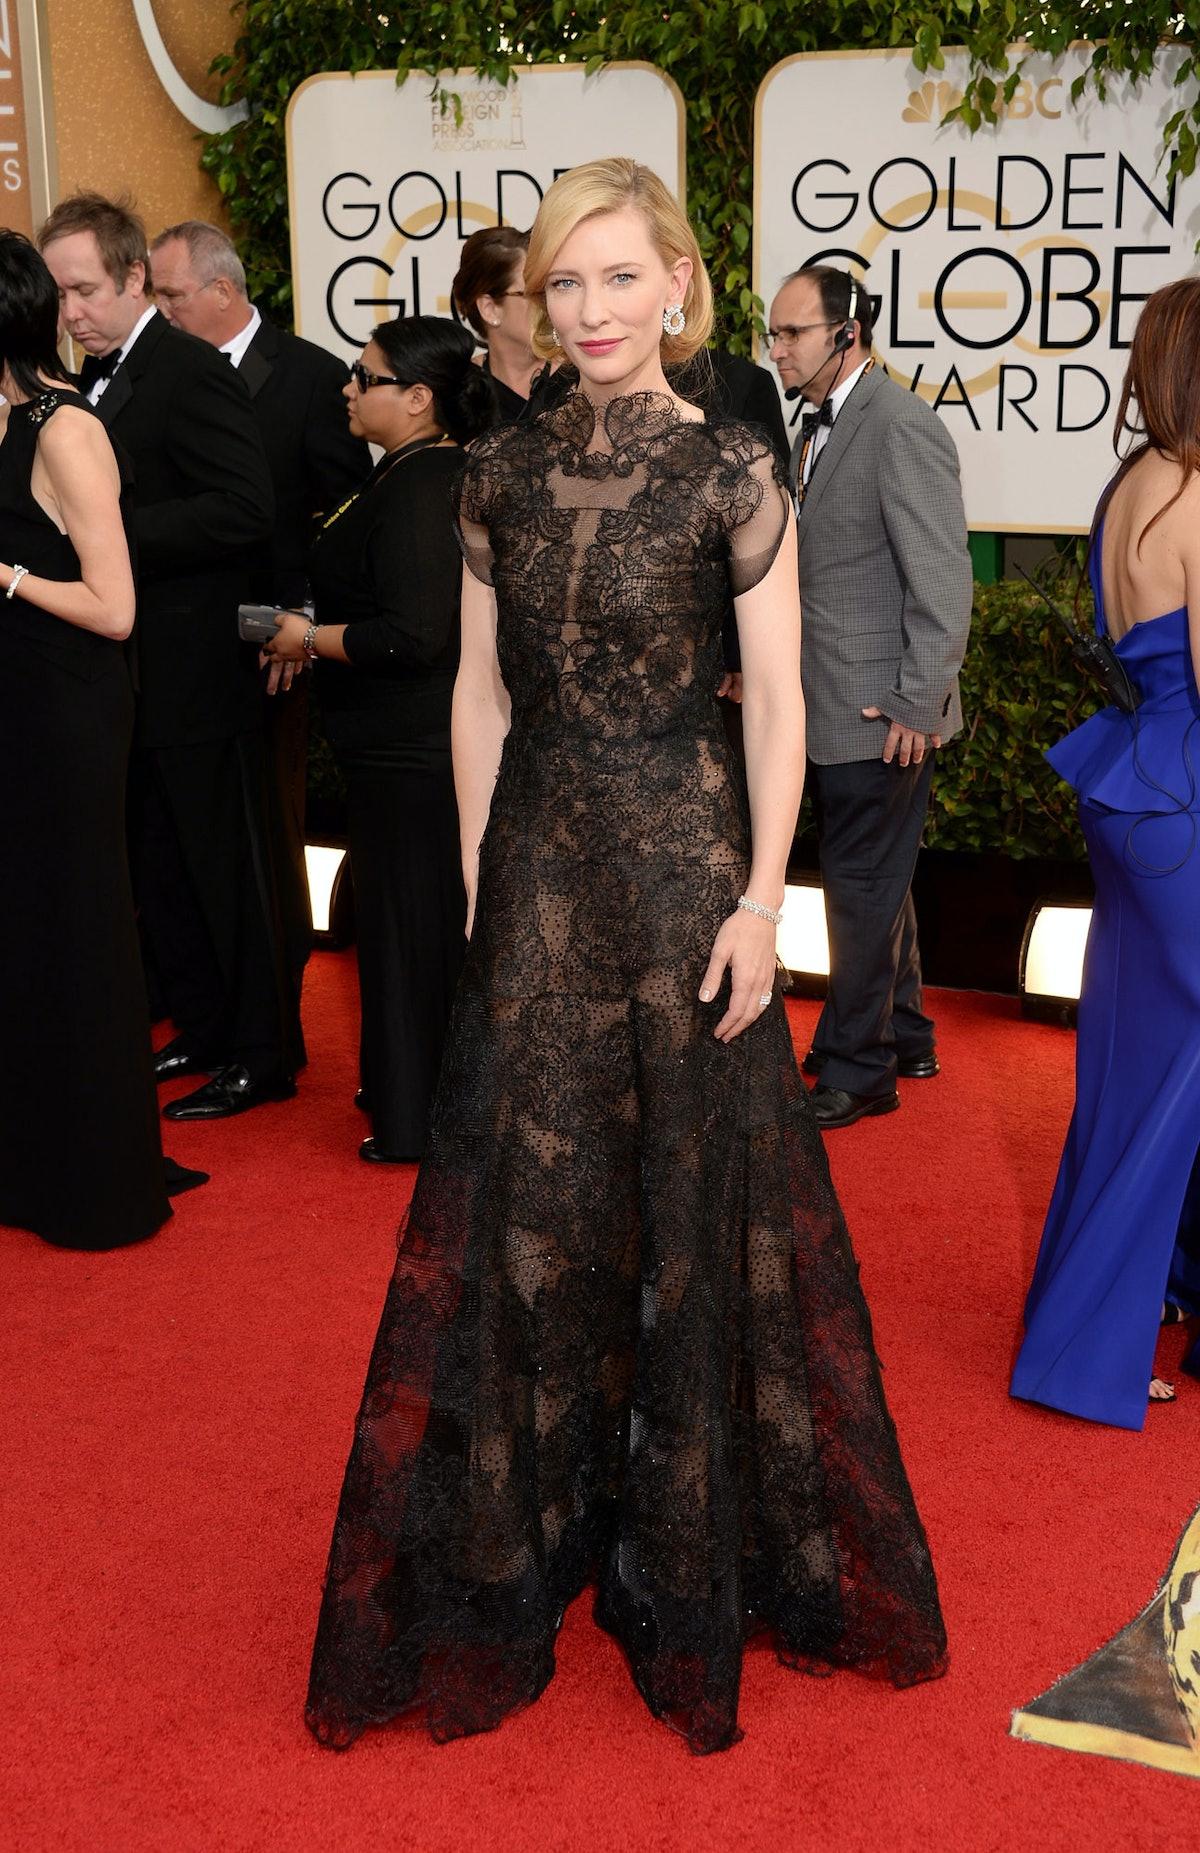 Golden Globe winner [Cate Blanchett](http://www.wmagazine.com/mood-board/filter?q=%5ECelebrity%7CCat...